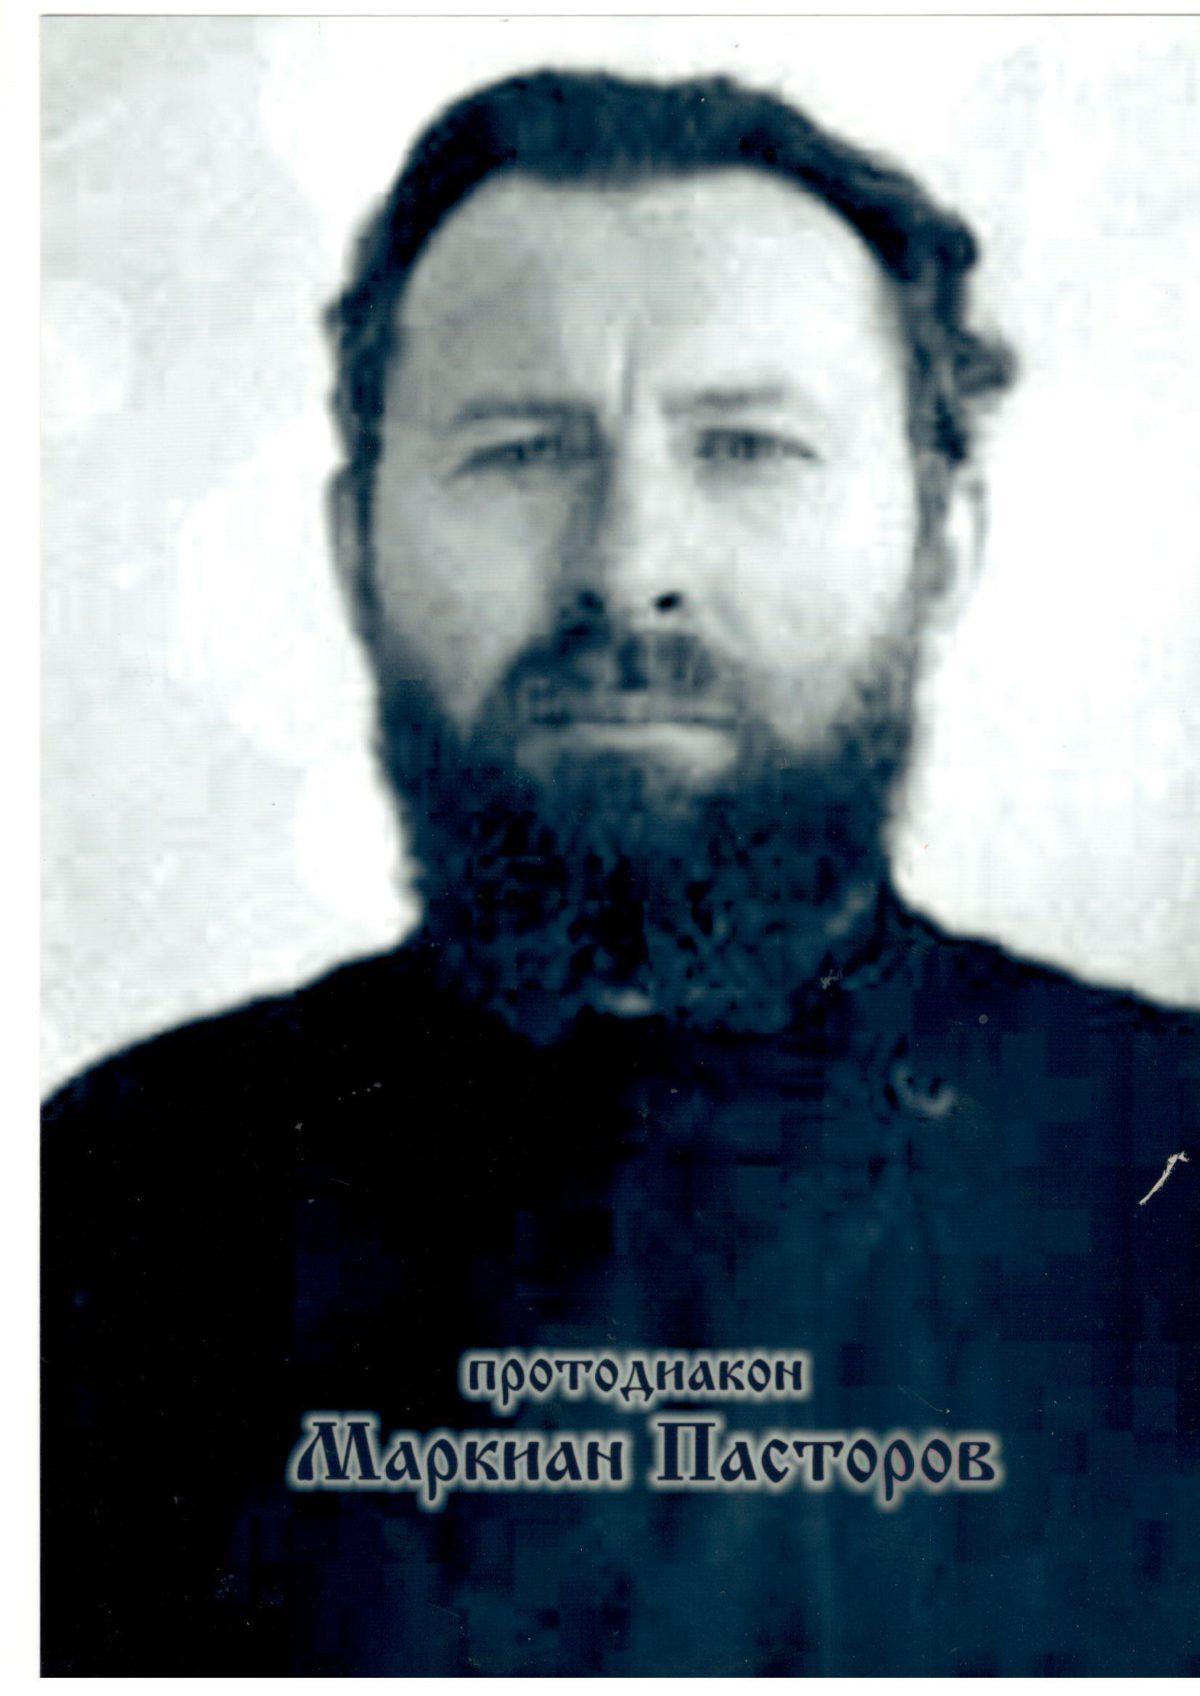 Протодиакон Маркиан Пасторов